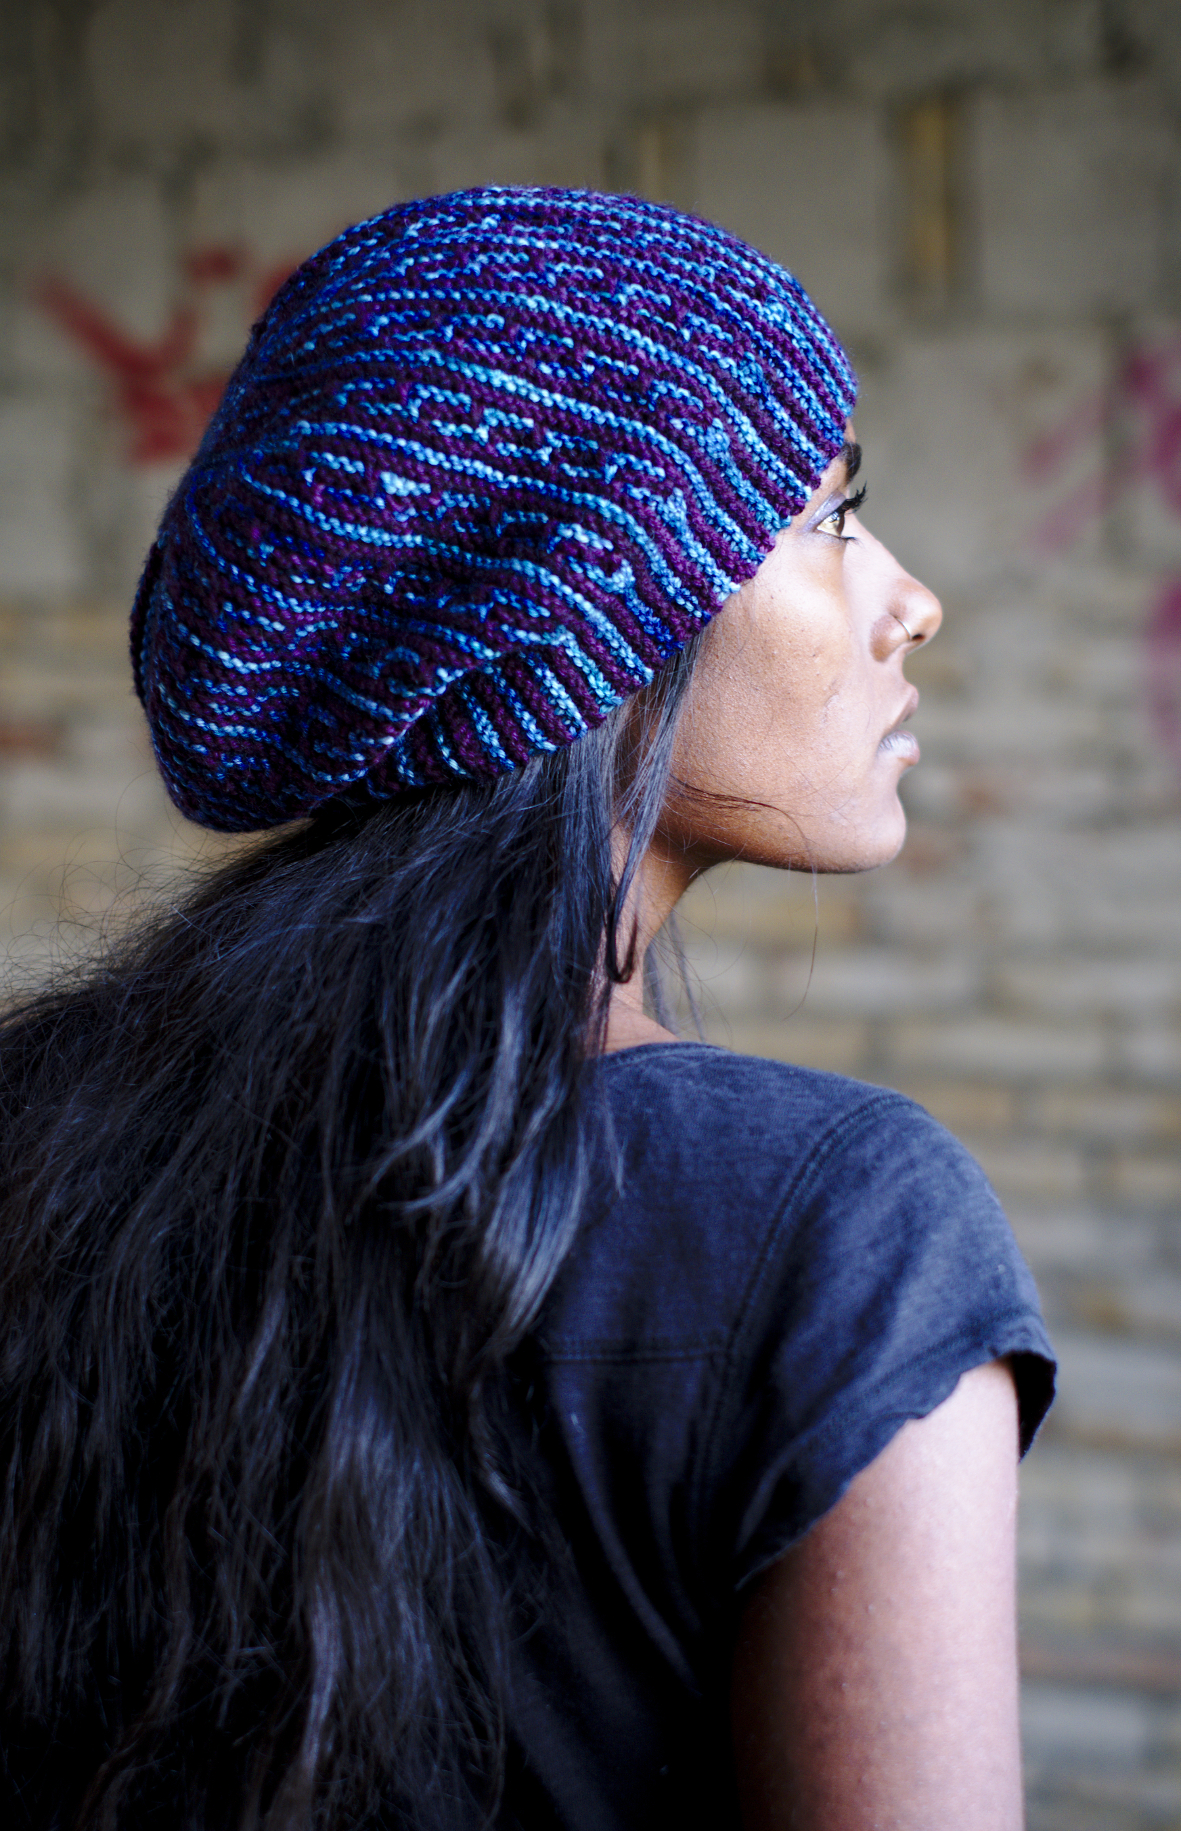 High Rise sideways knit mosaic slipped stitch colourwork Hat hand knitting pattern for DK yarn